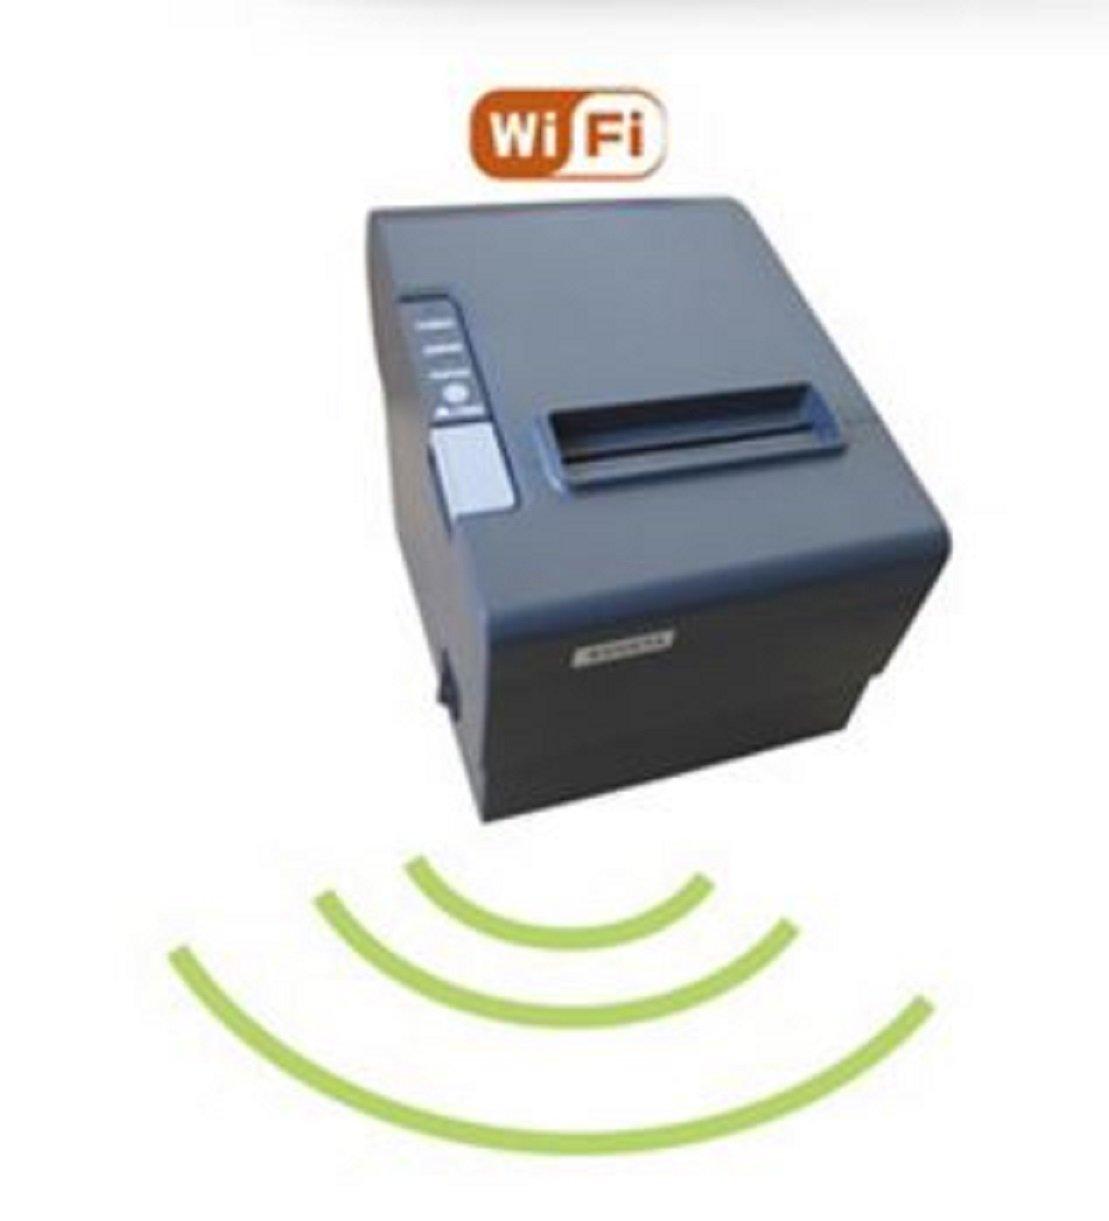 Hubrox Thermal Receipt Printer HB80 3''(80mm) USB-WiFi-Serial 250mm/s Hubrox Technology Inc. HBP80W